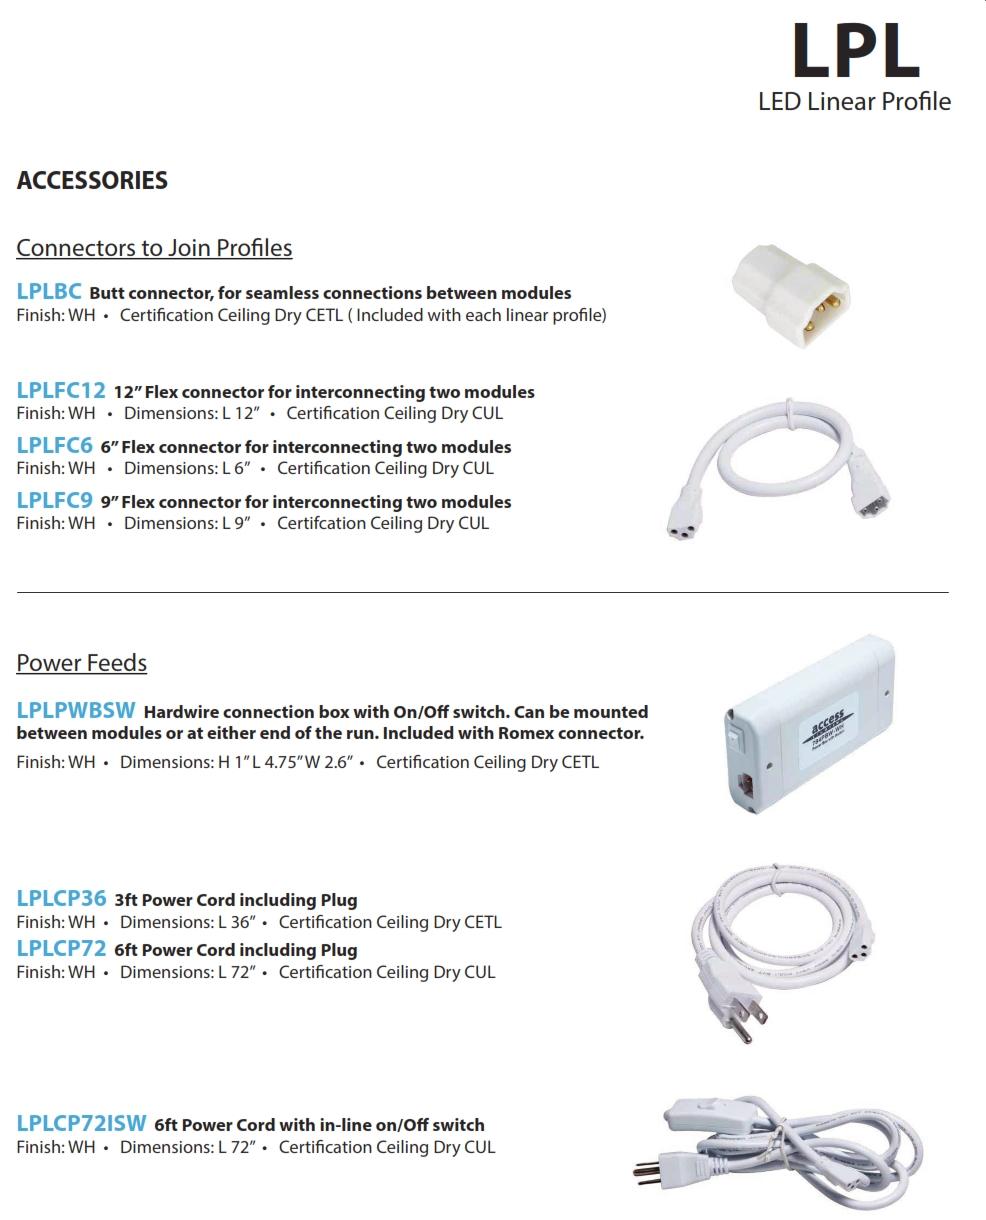 14 wattlow profile led linear lighting system lighting supply lplcat1g lplcat2g xflitez Images